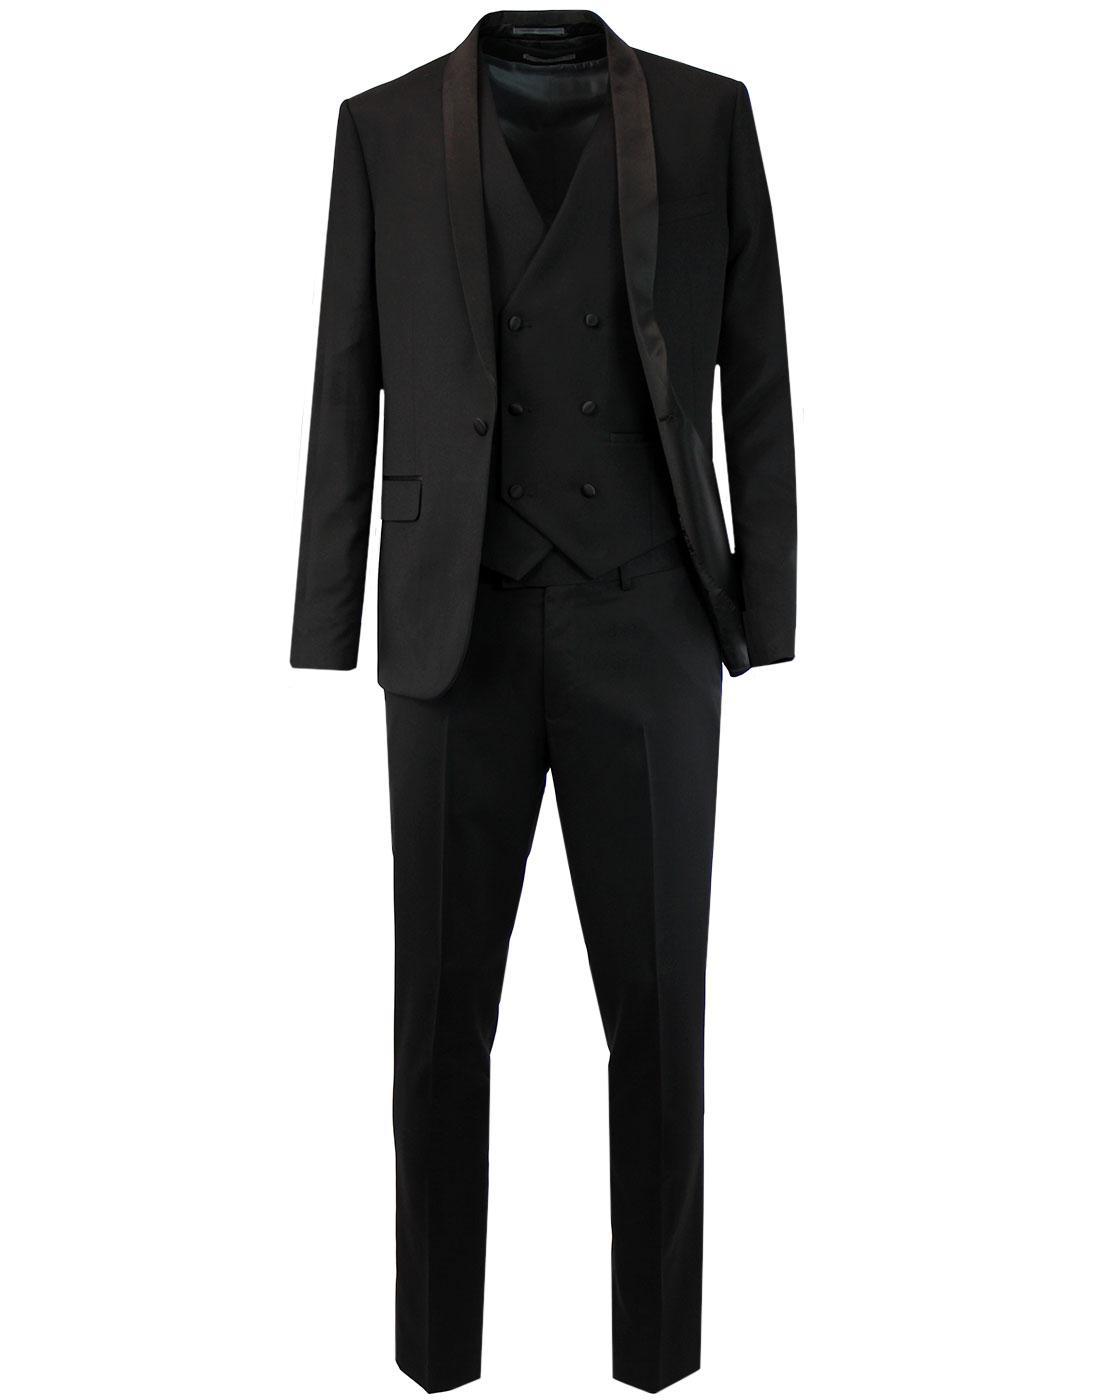 FARAH Retro 1960s Shawl Collar Dinner Suit - Black